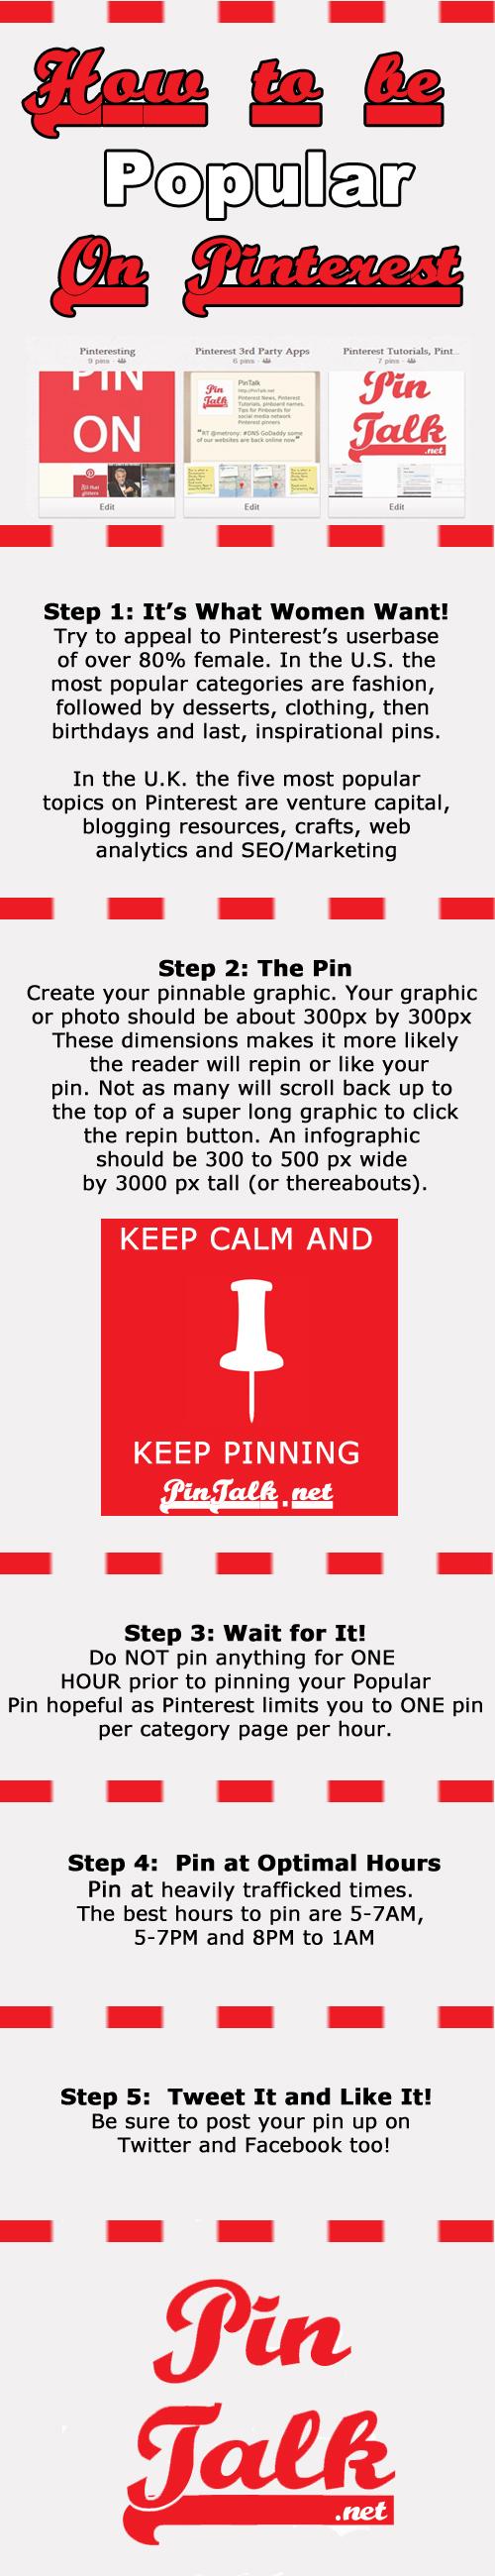 Pinterest Popular Pin Infographic